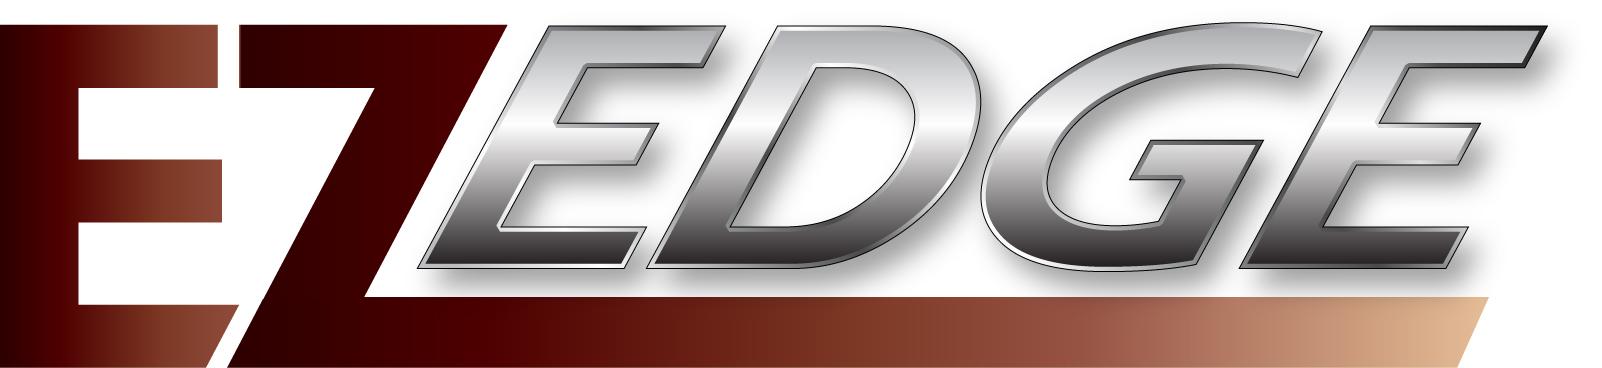 EZ-edge_logo.jpg